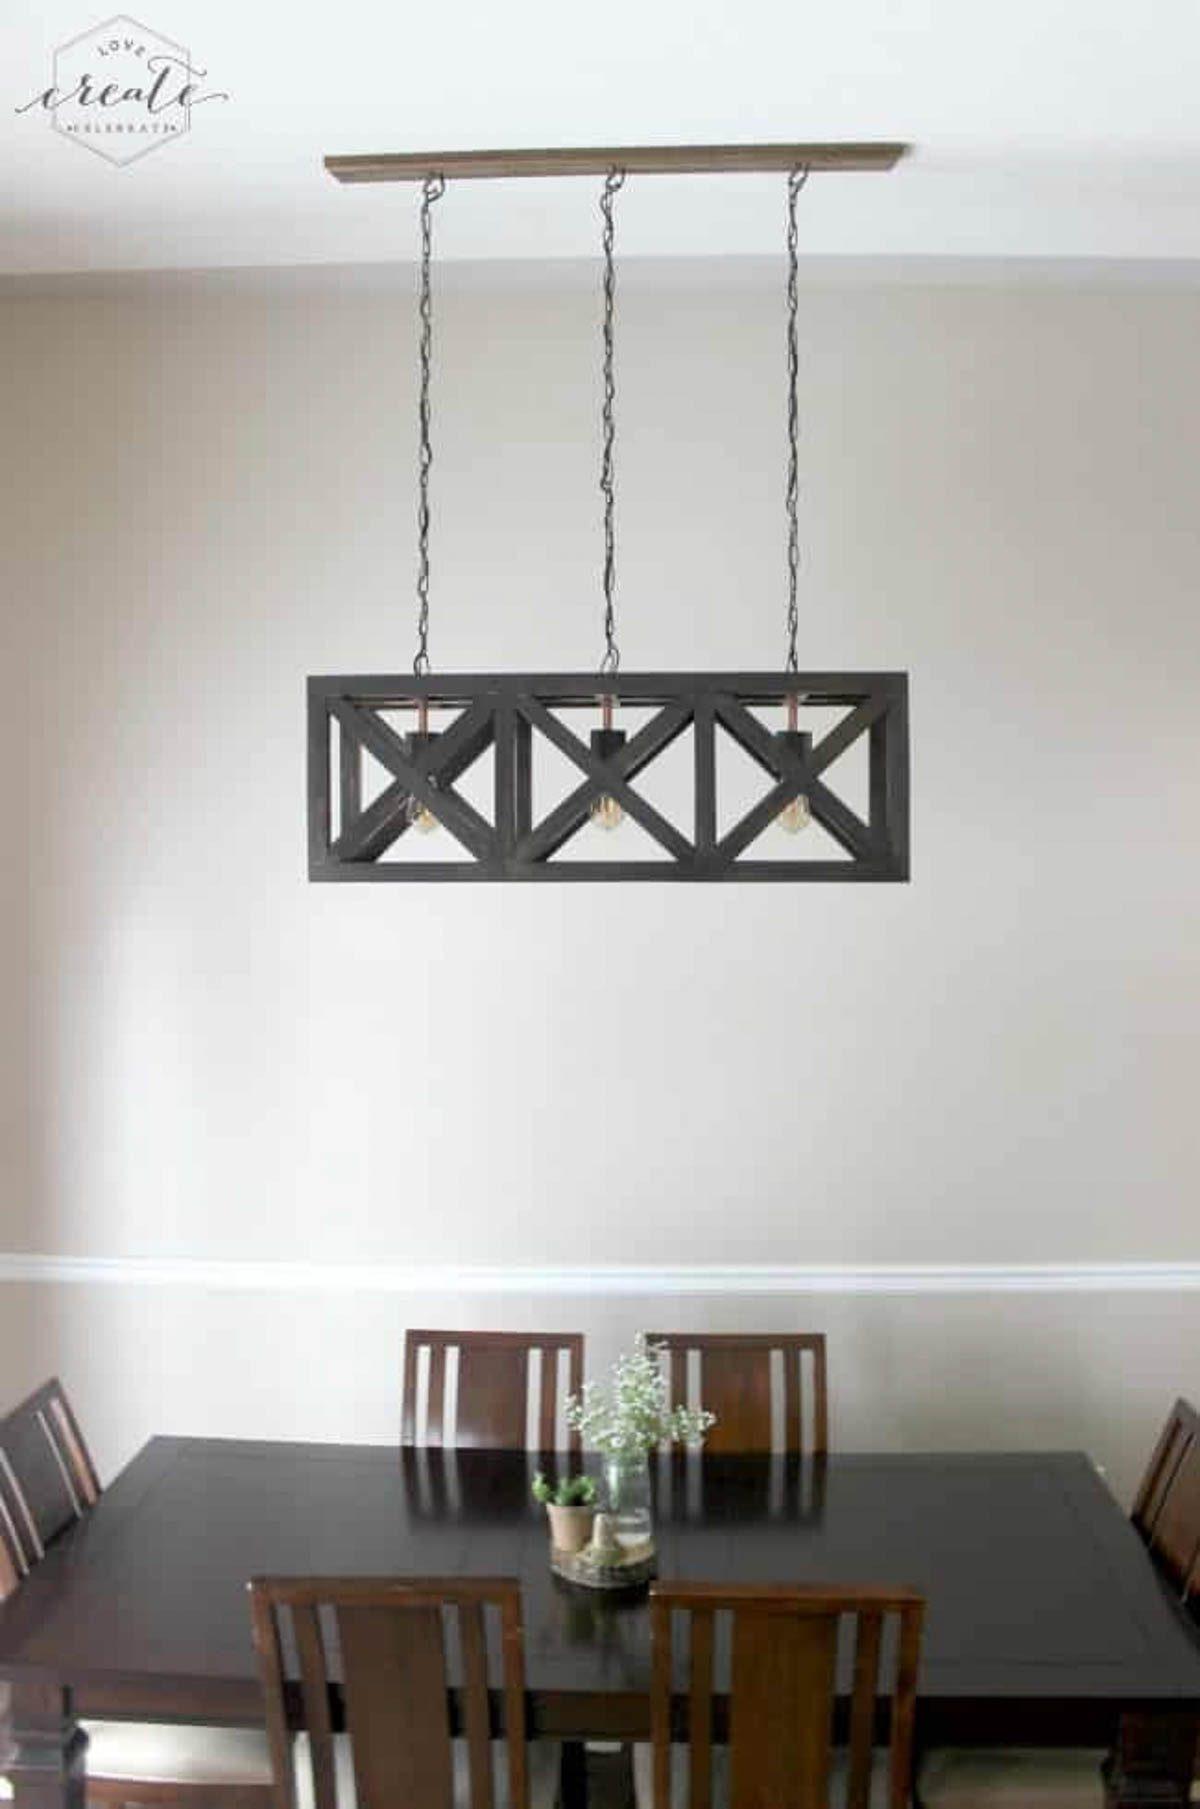 Industrial pendant light in dining room